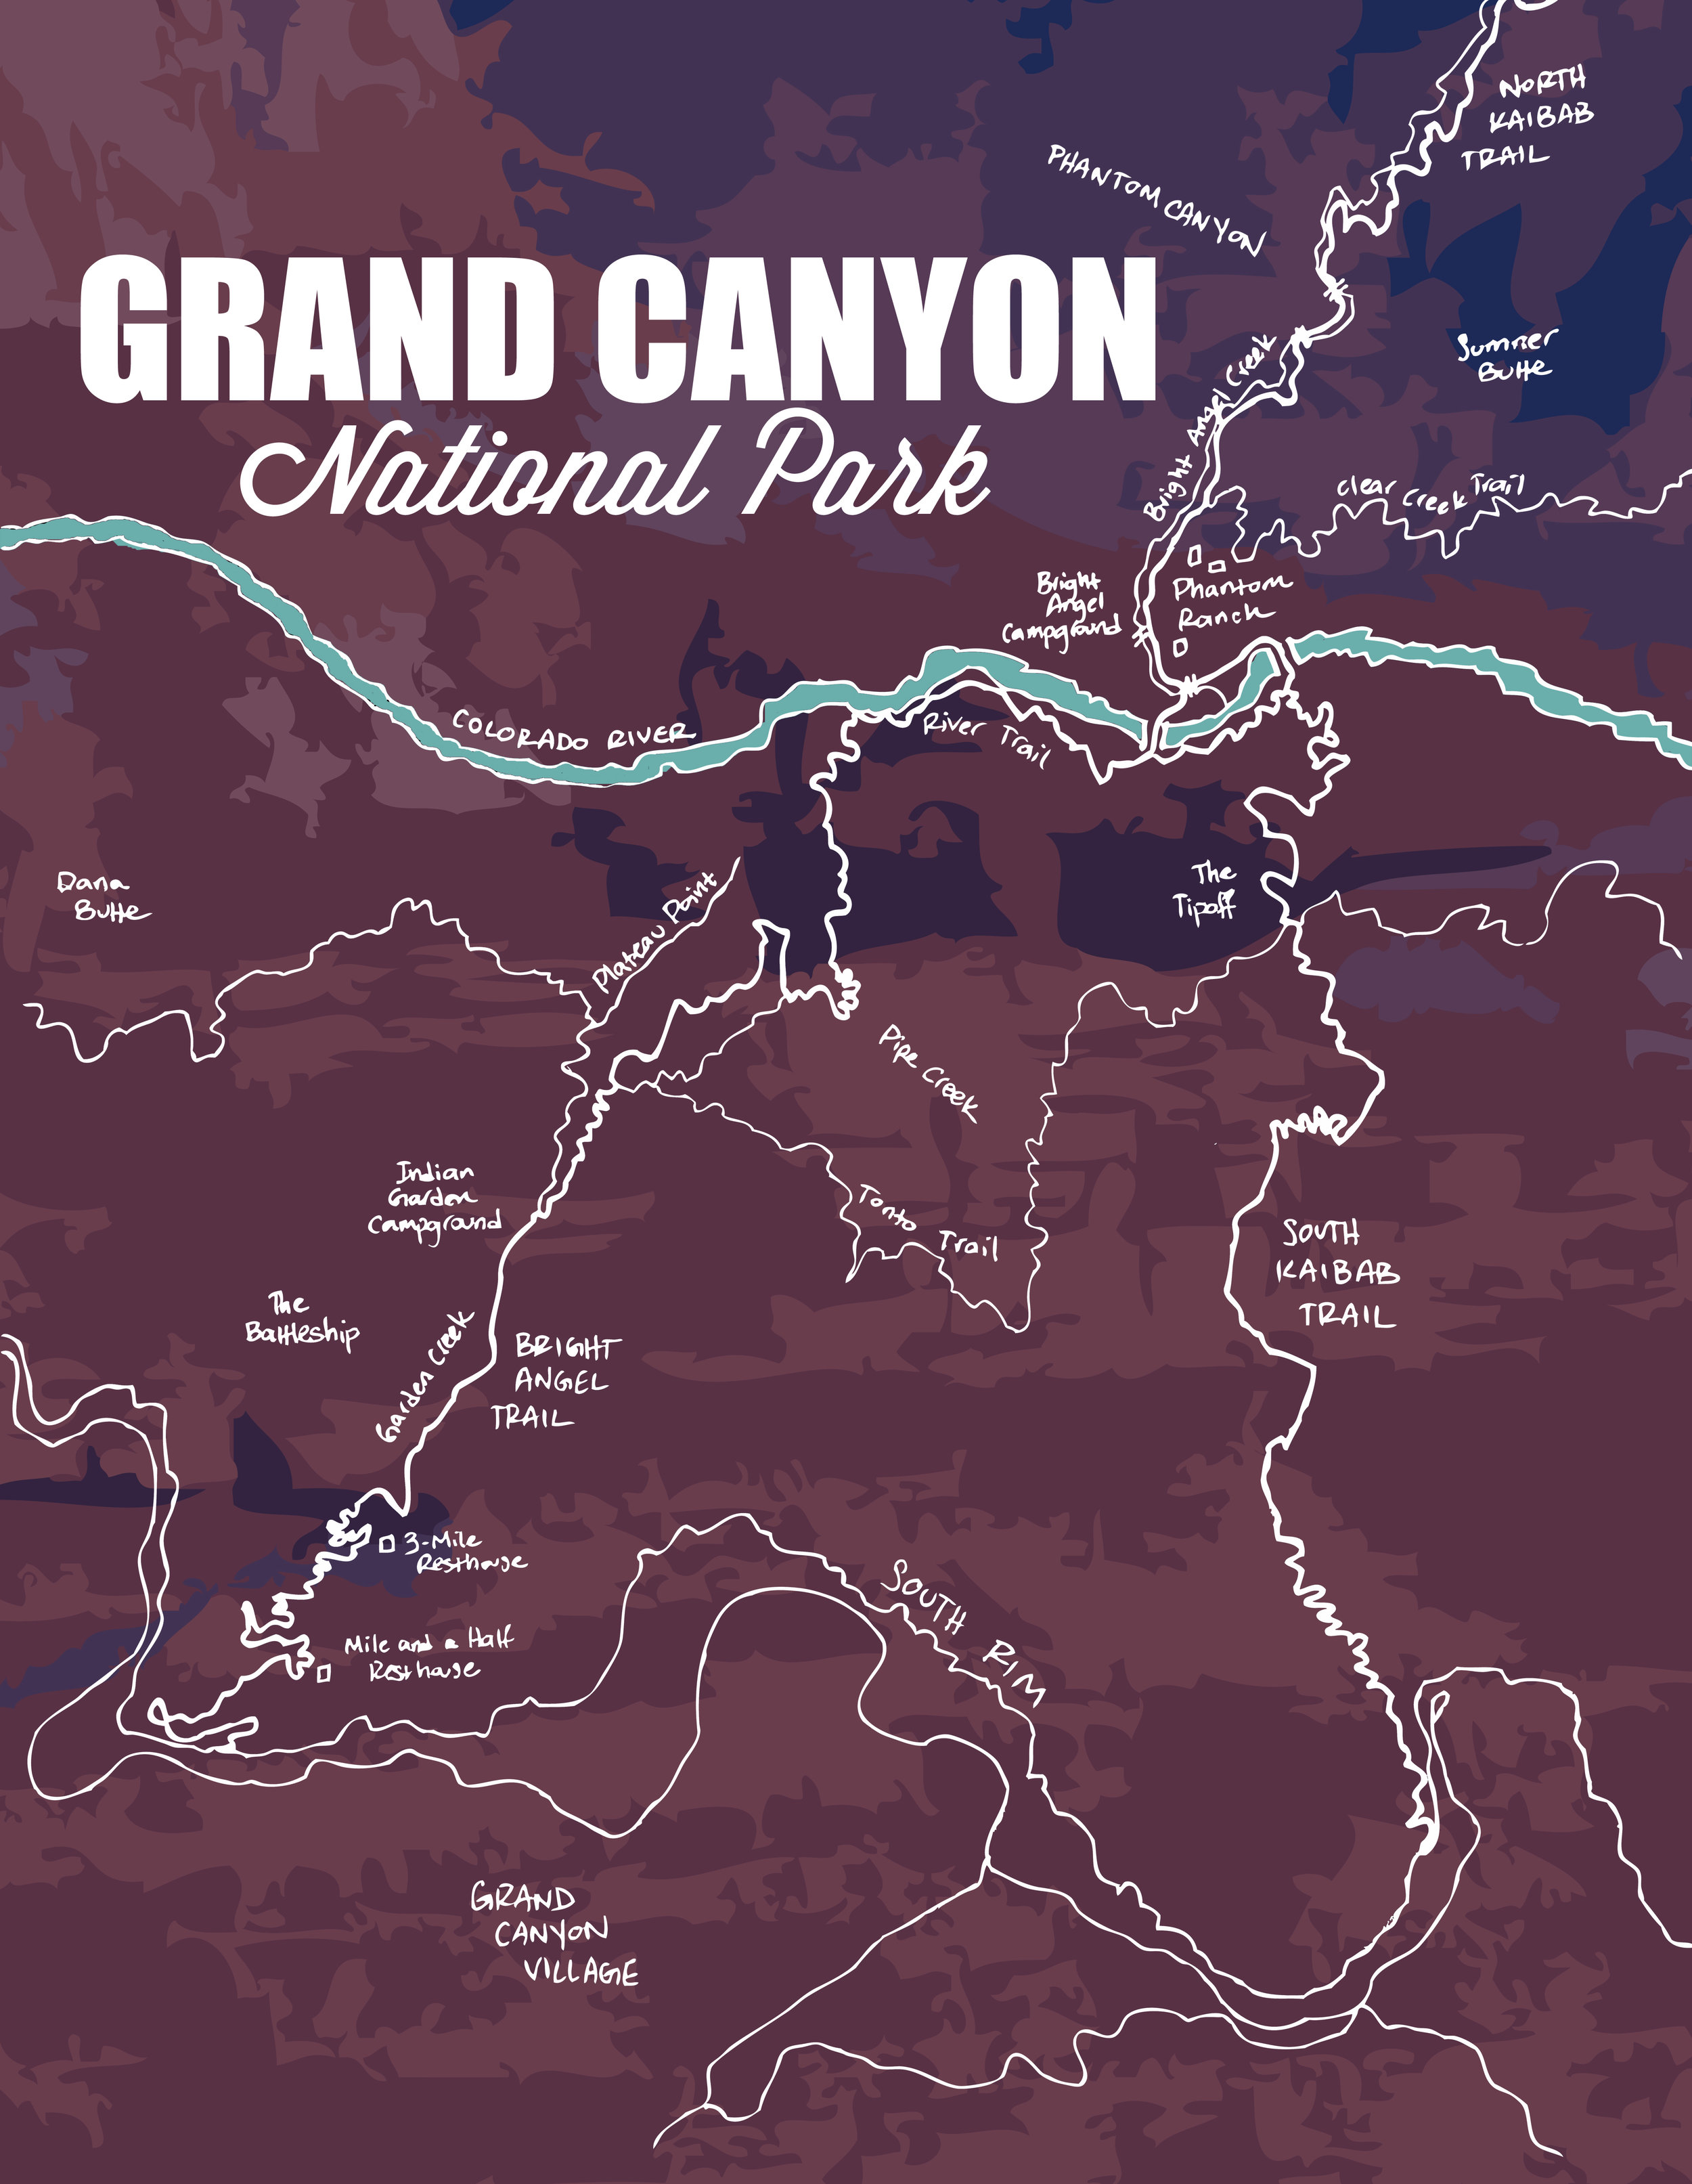 Grand Canyon National Park, 2015